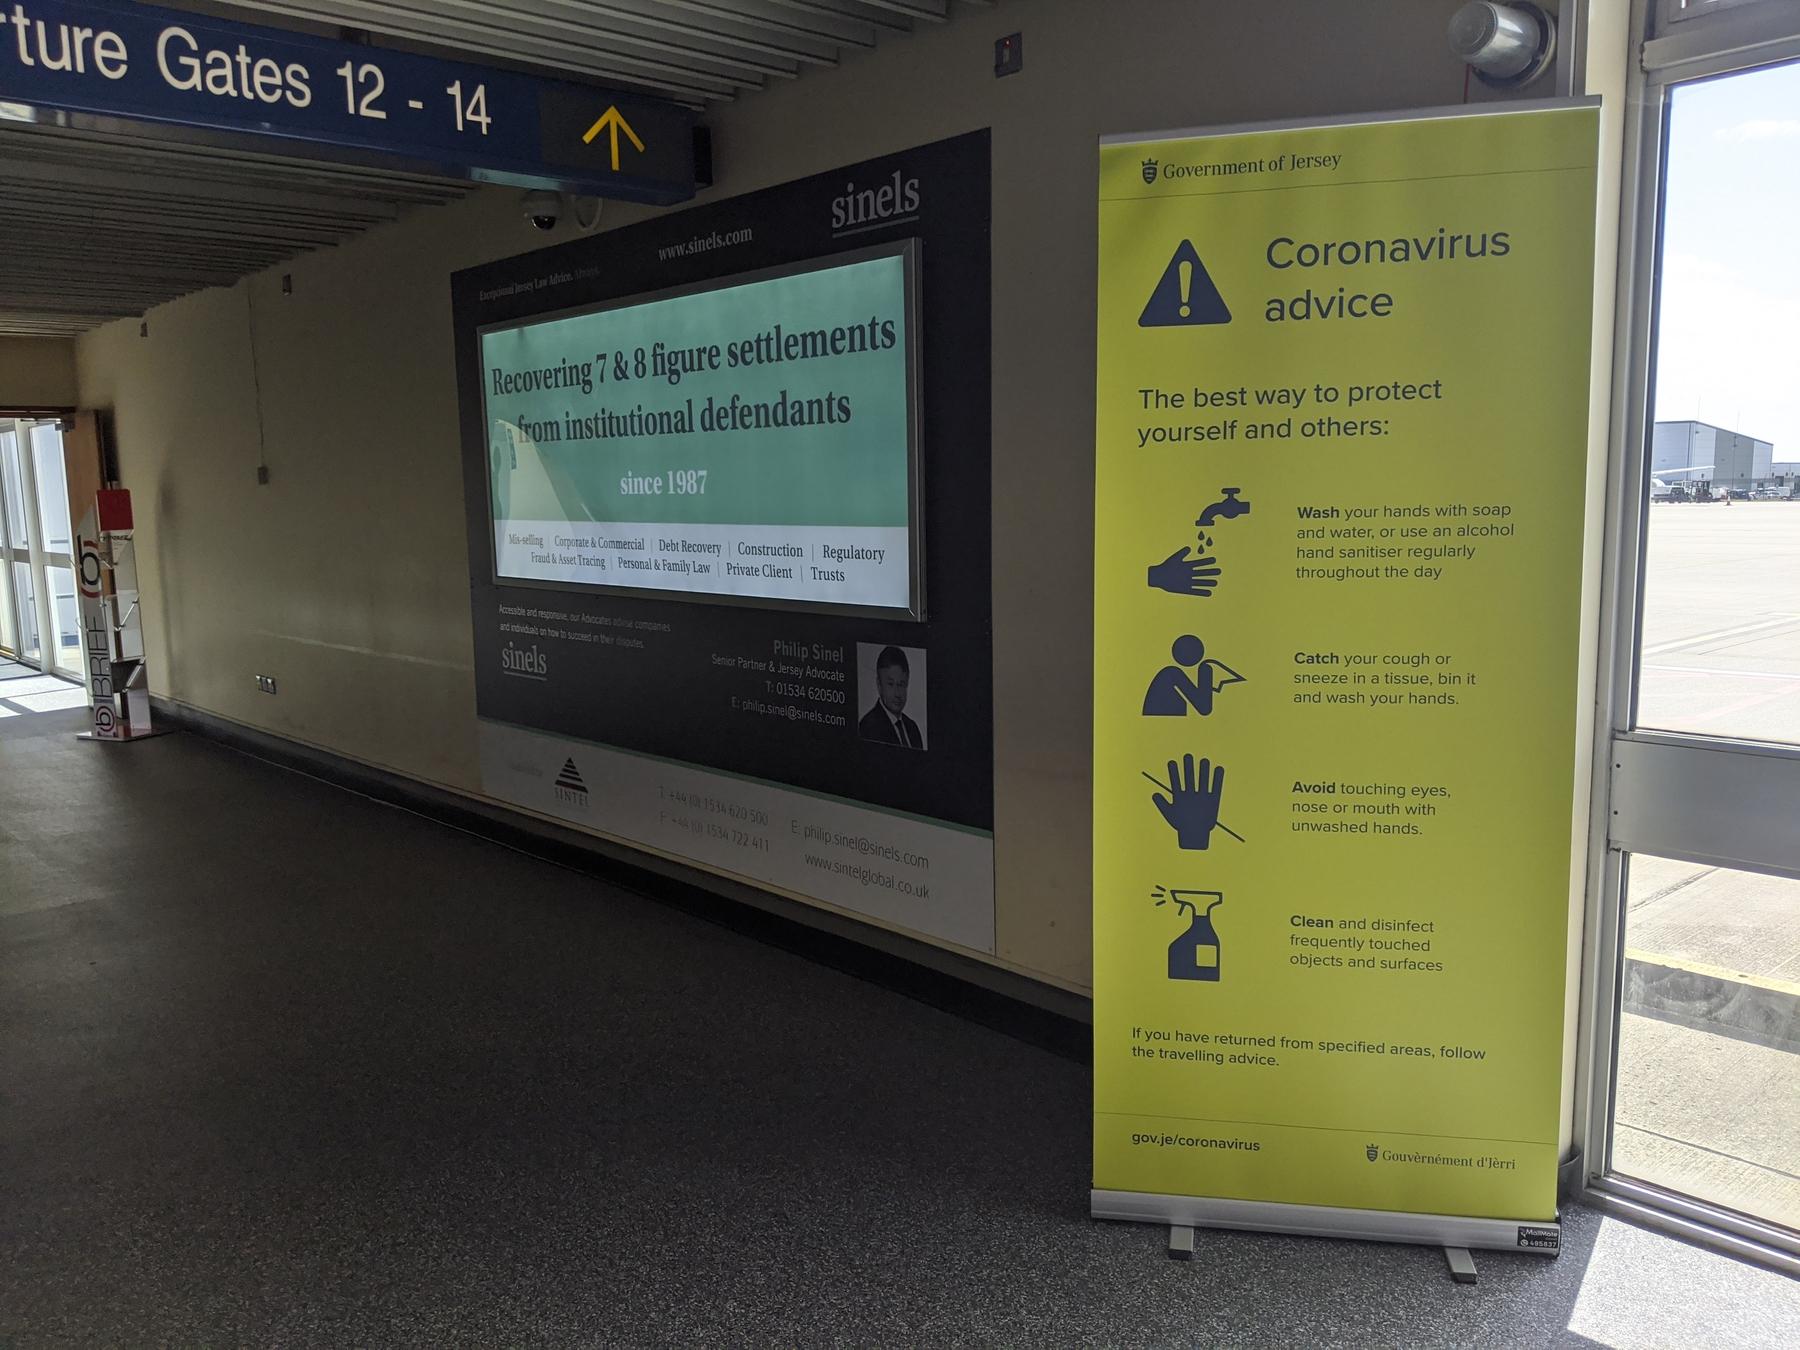 Аэропорт Глазго во время пандемии коронавируса